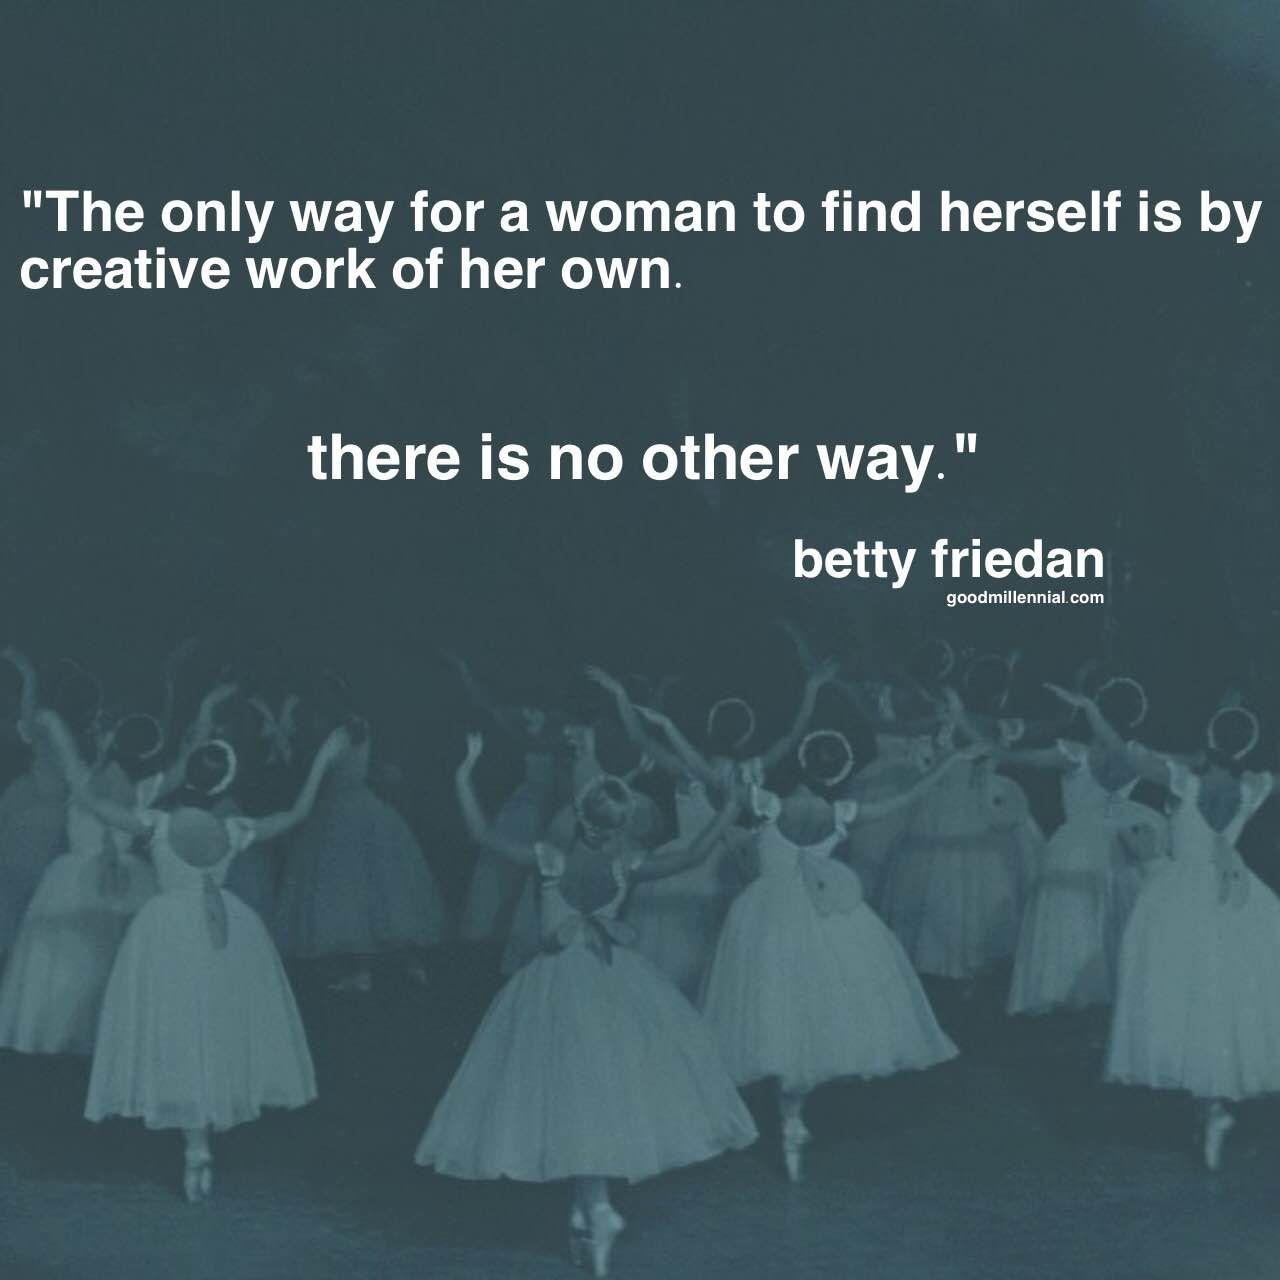 Celebrating Women's History Month: Betty Friedan